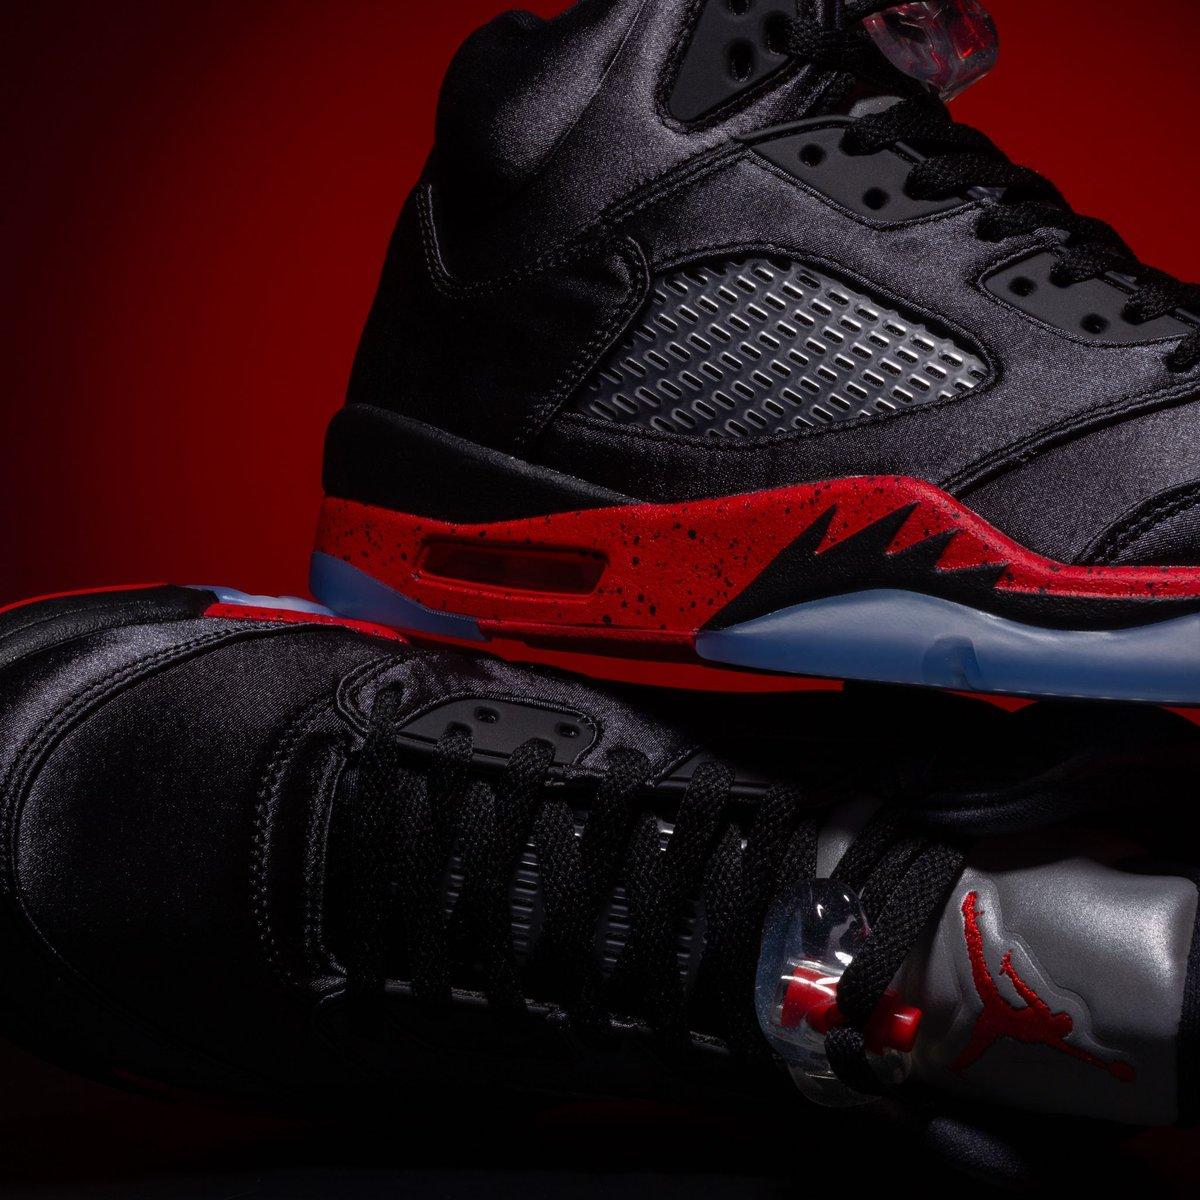 sports shoes a16b5 9aef3 O U T 🔥 N O W ❗ Air Jordan 5 Retro